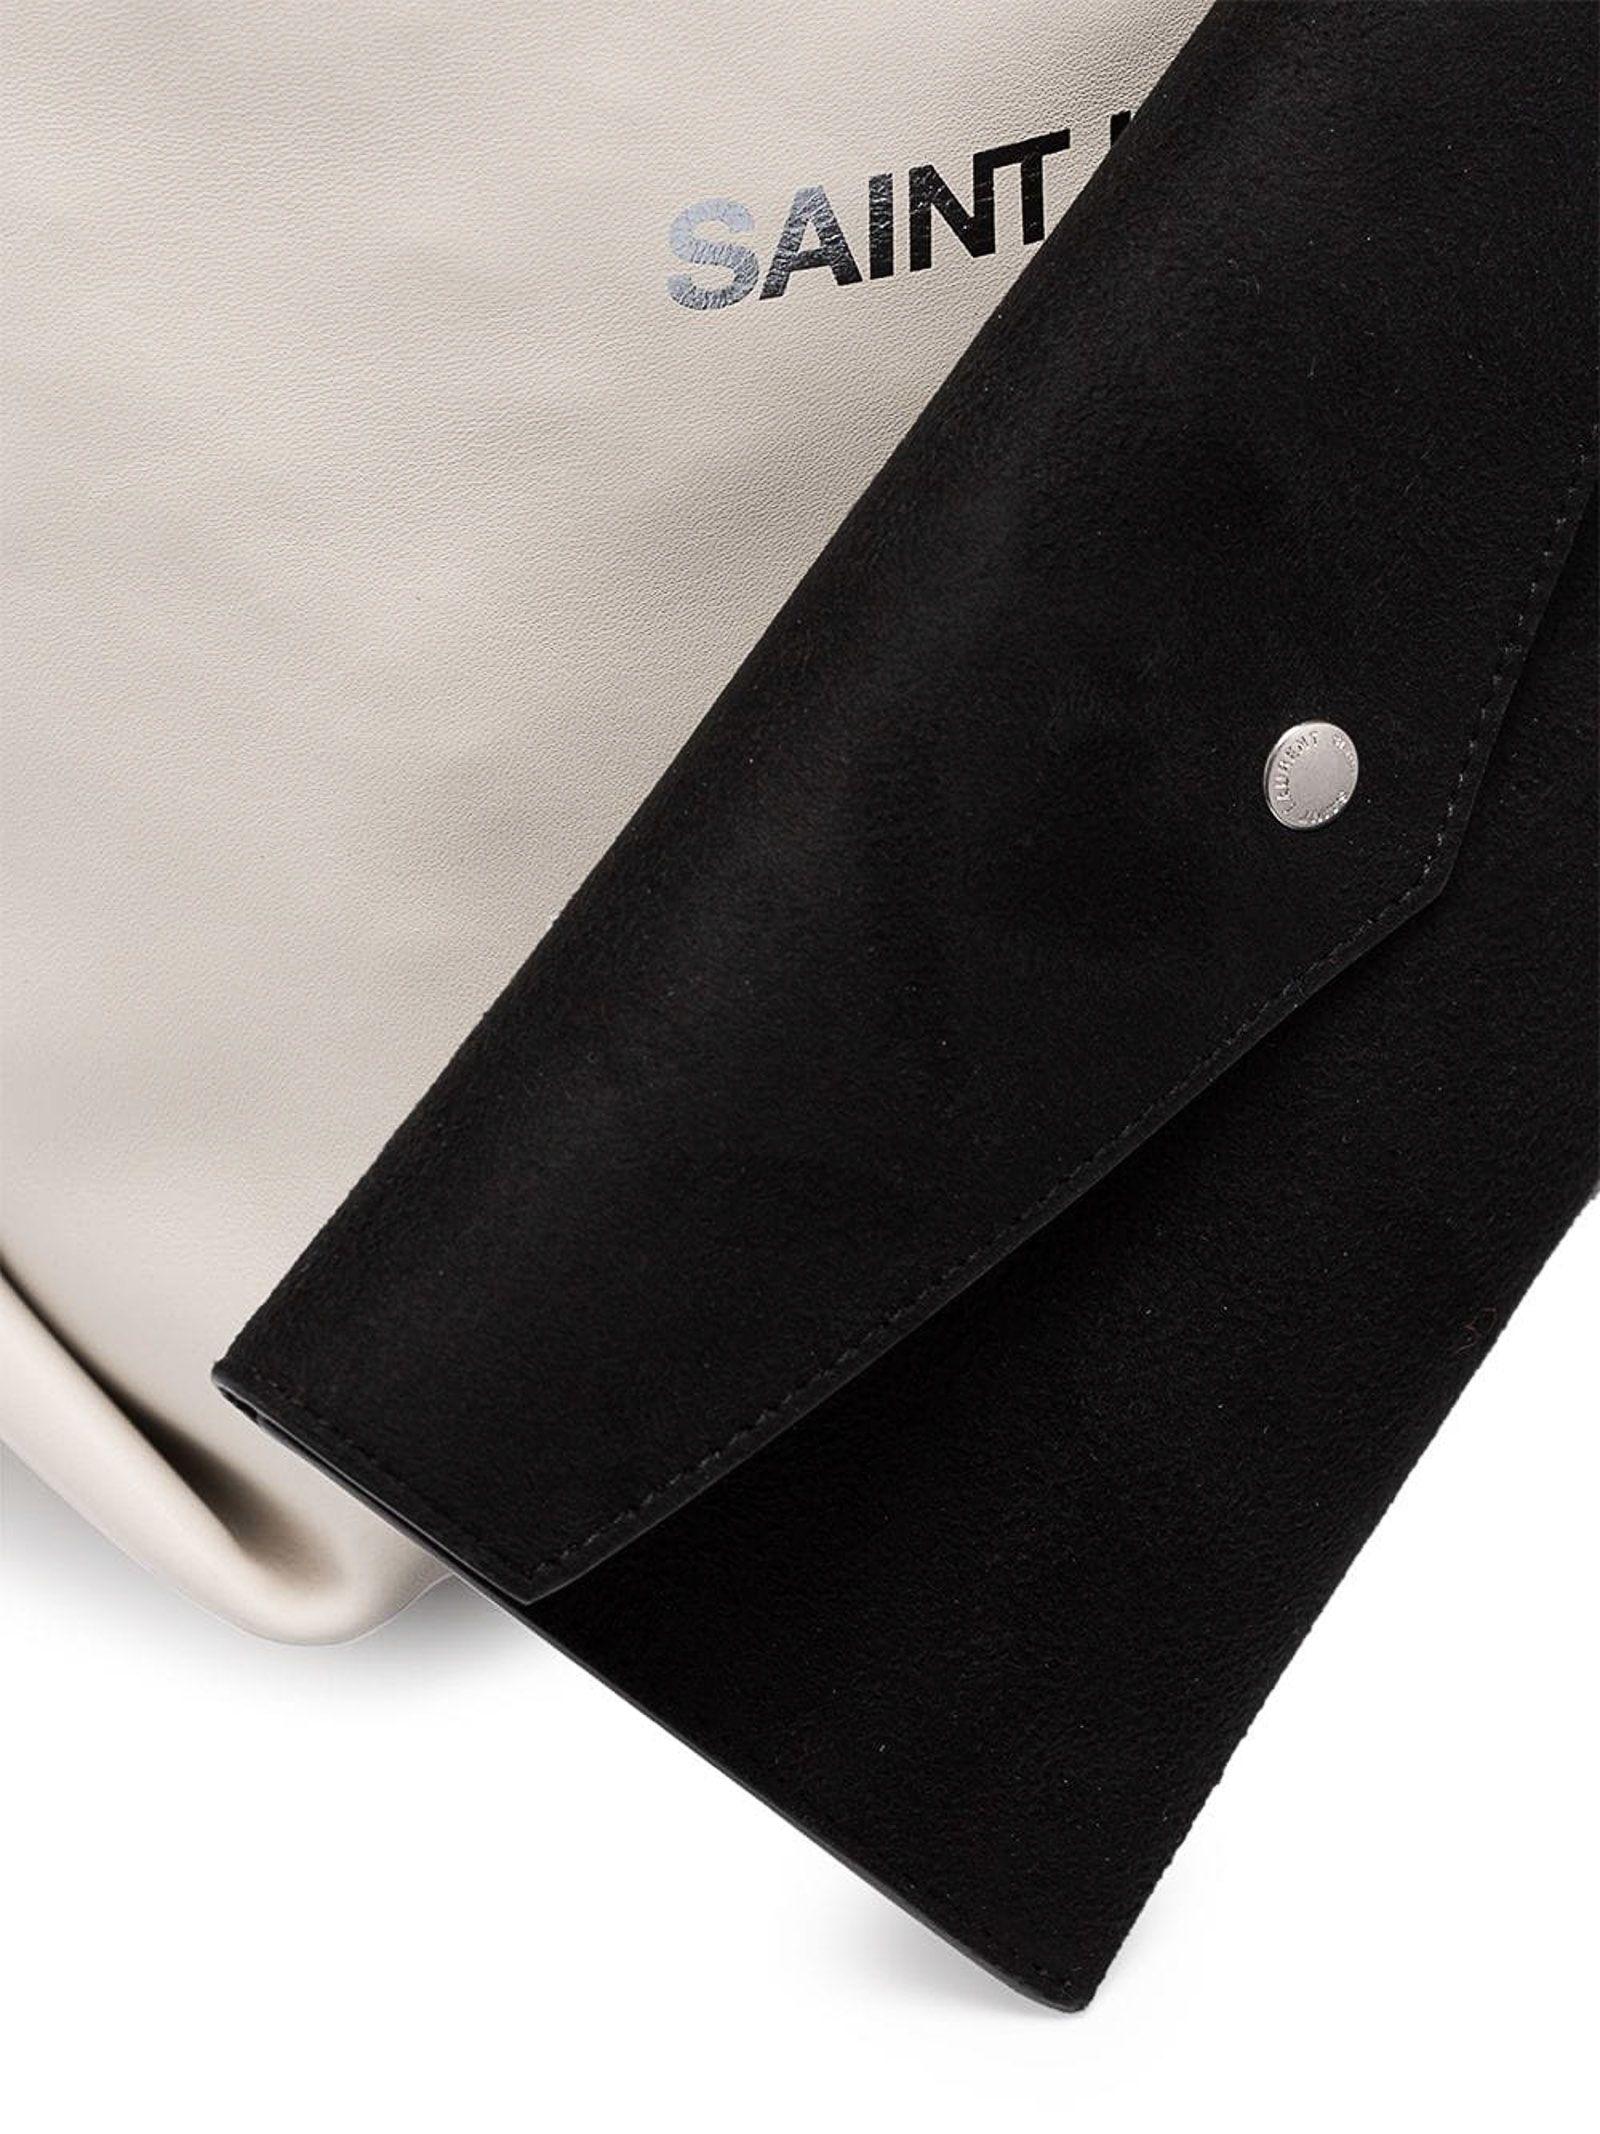 d66917b572 Saint Laurent Saint Laurent Classic Bucket Bag - Crema Soft ...